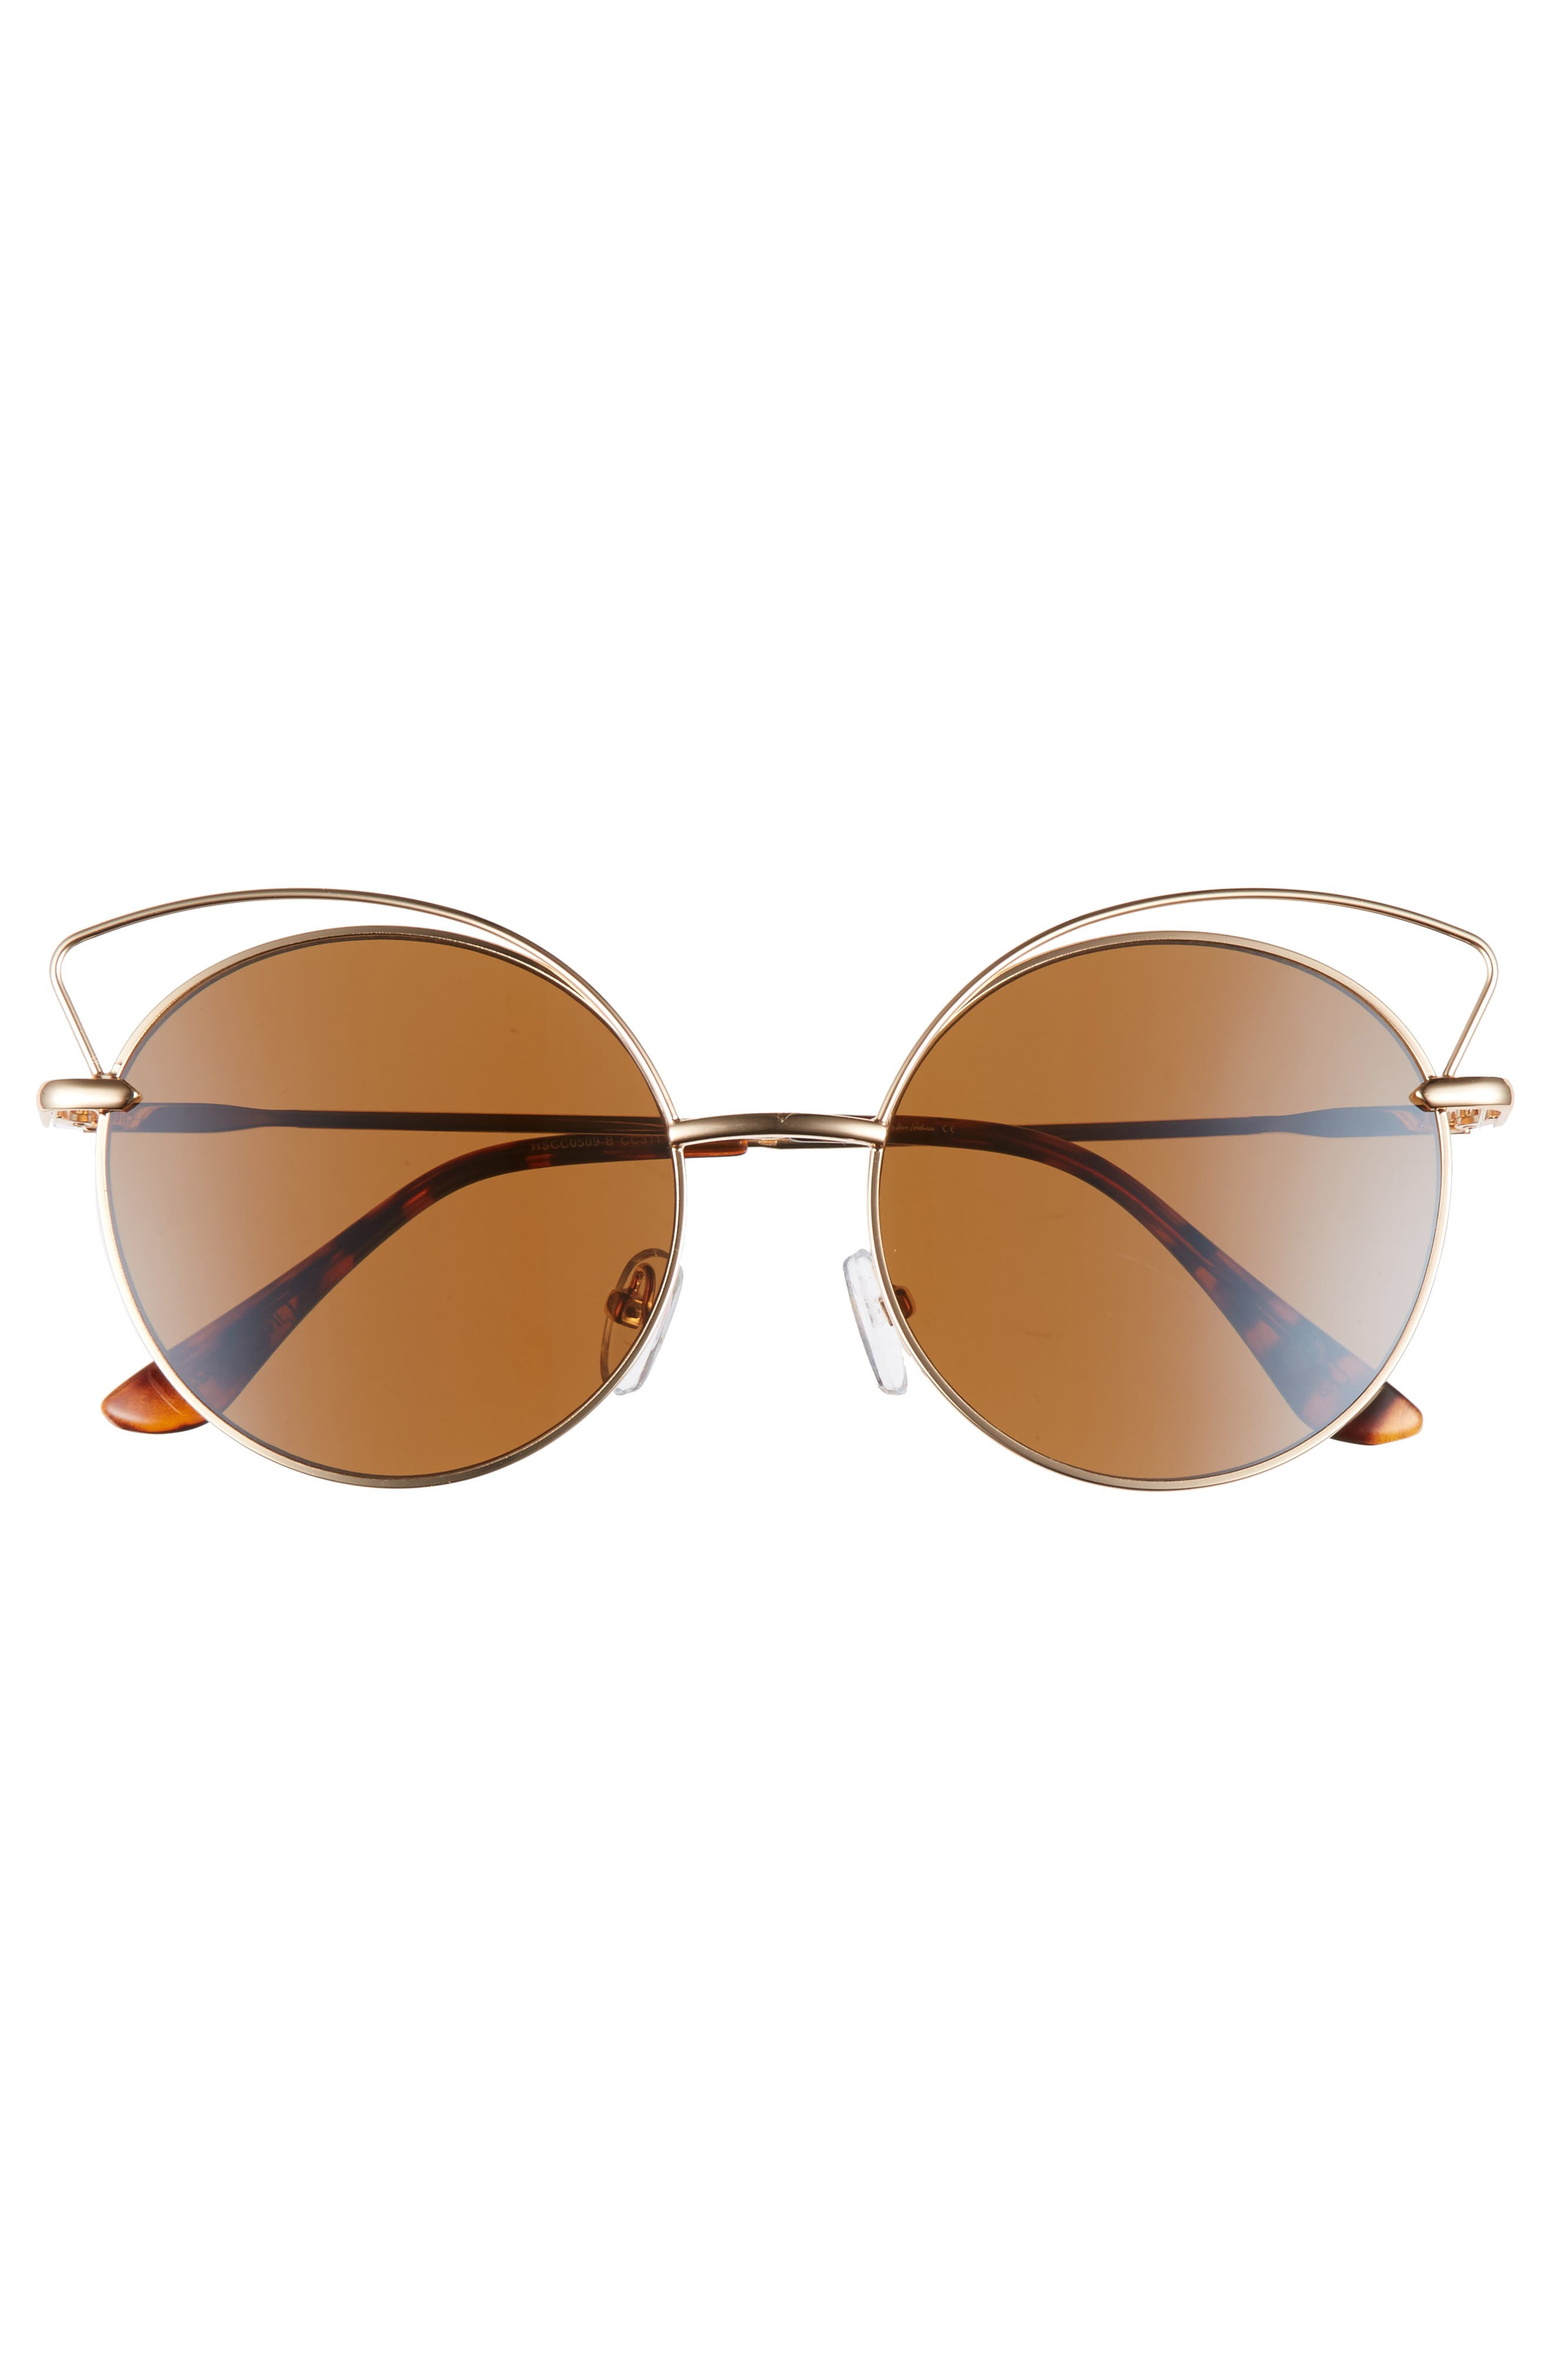 Satellite 55mm Round Sunglasses,                             Alternate thumbnail 3, color,                             Gold